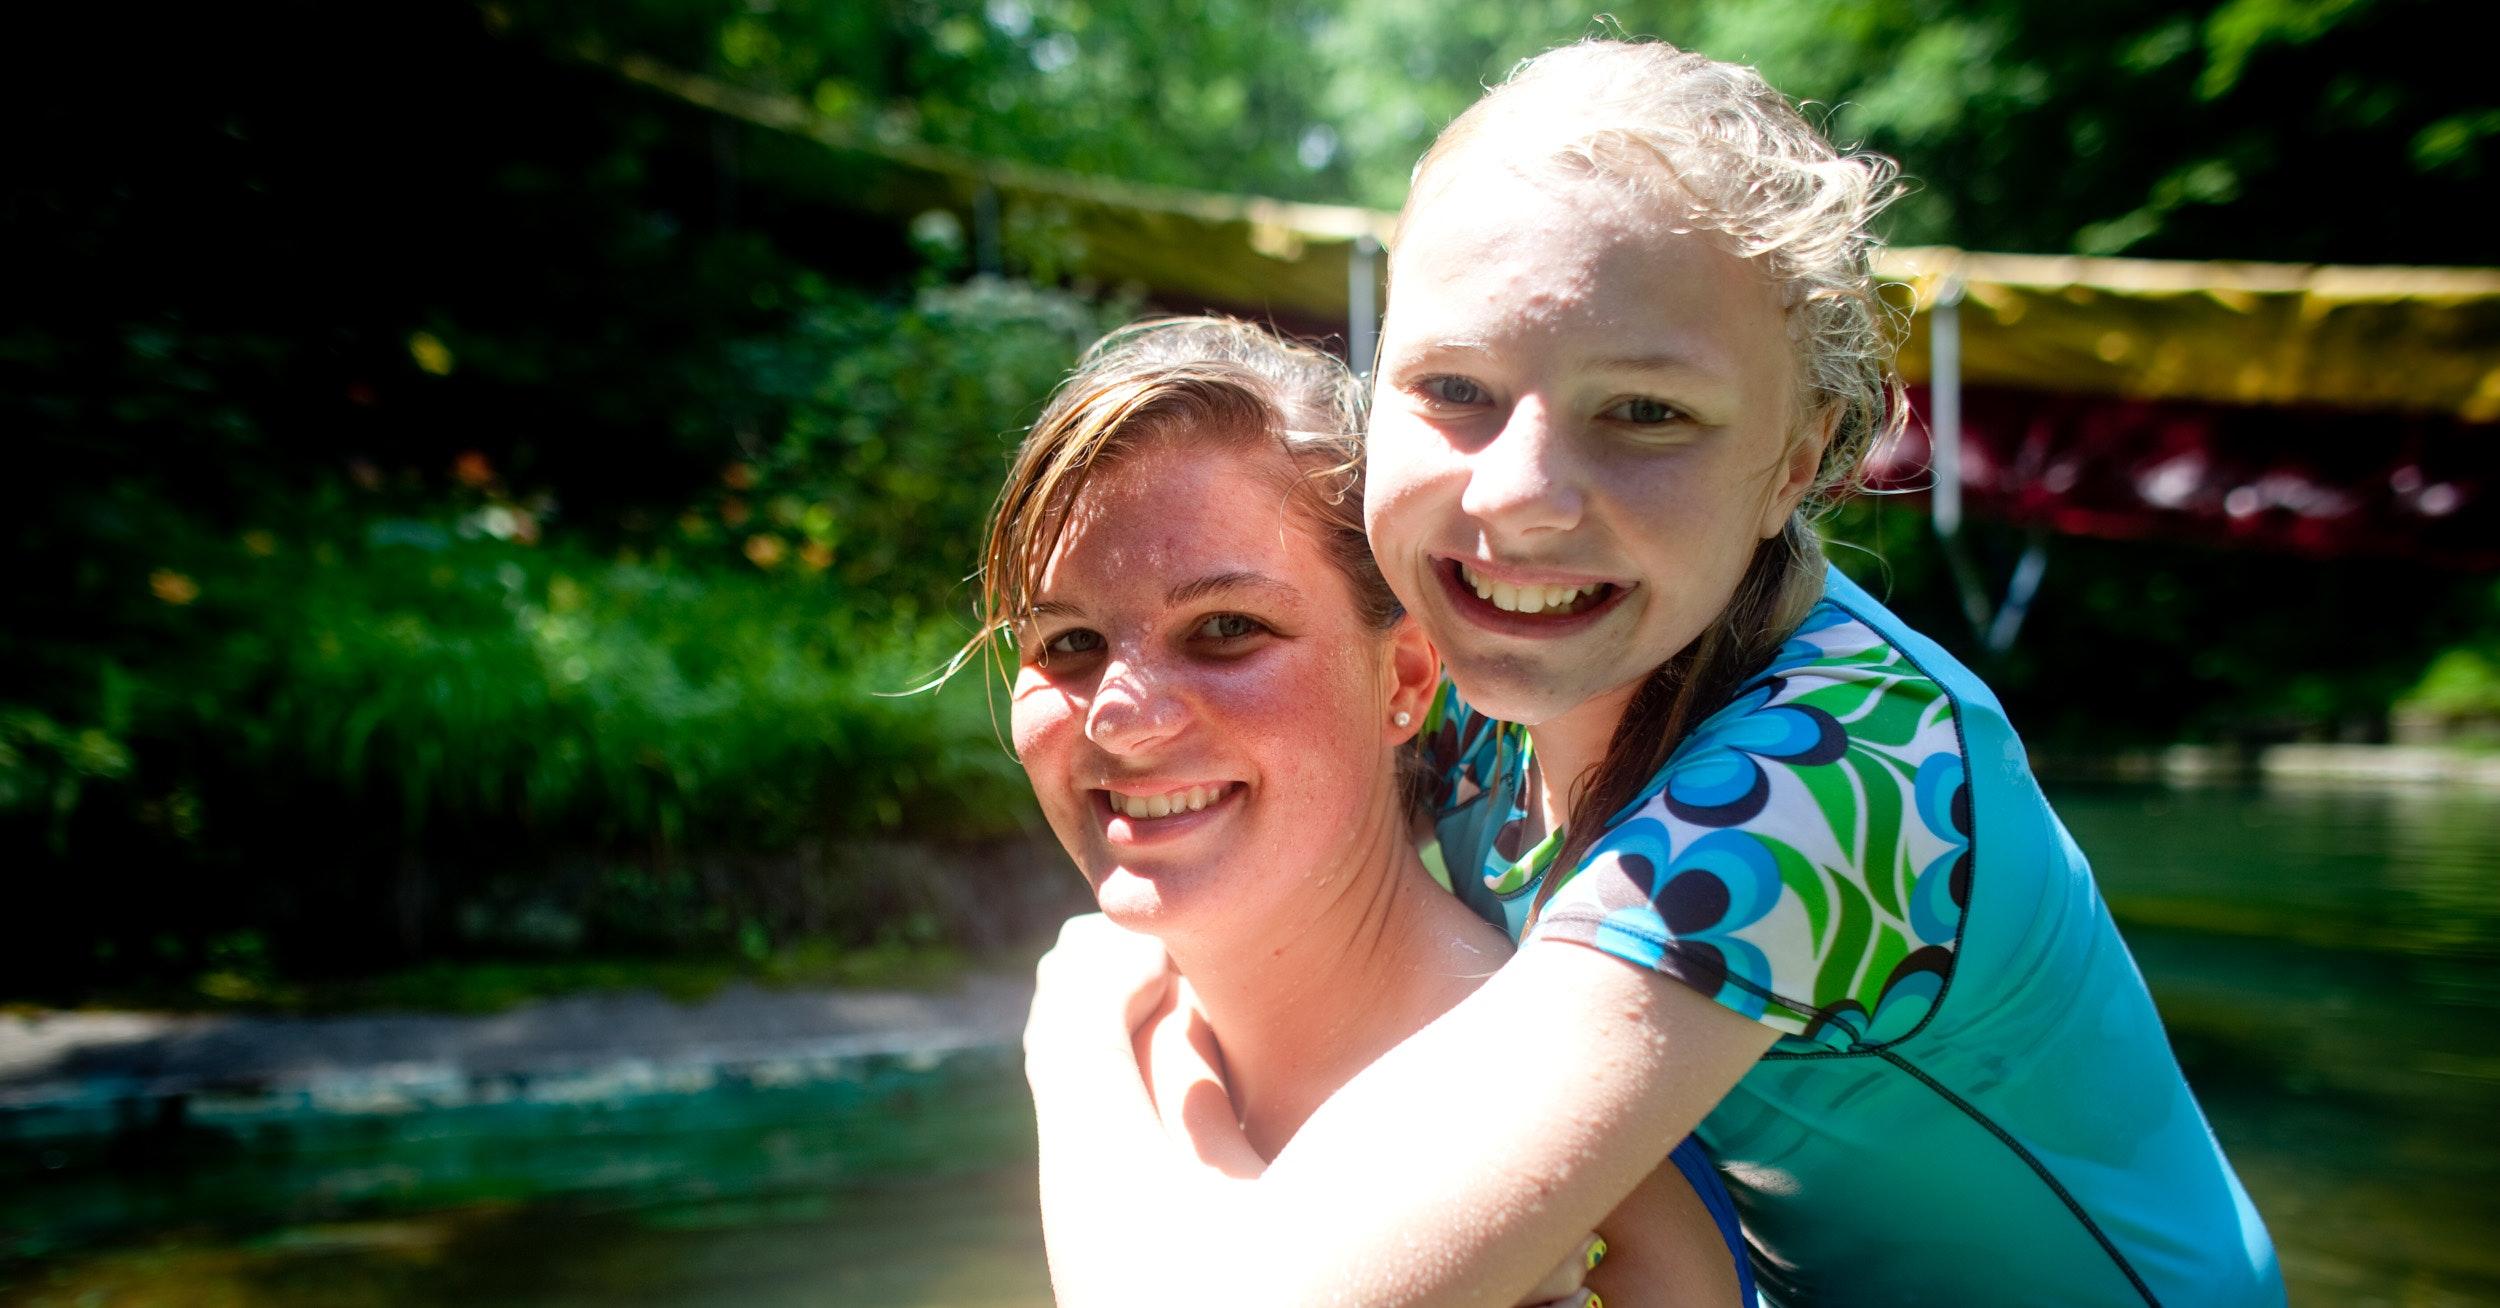 Coming to keystone summer camp for girls in brevard north carolina.jpg?ixlib=rails 2.1